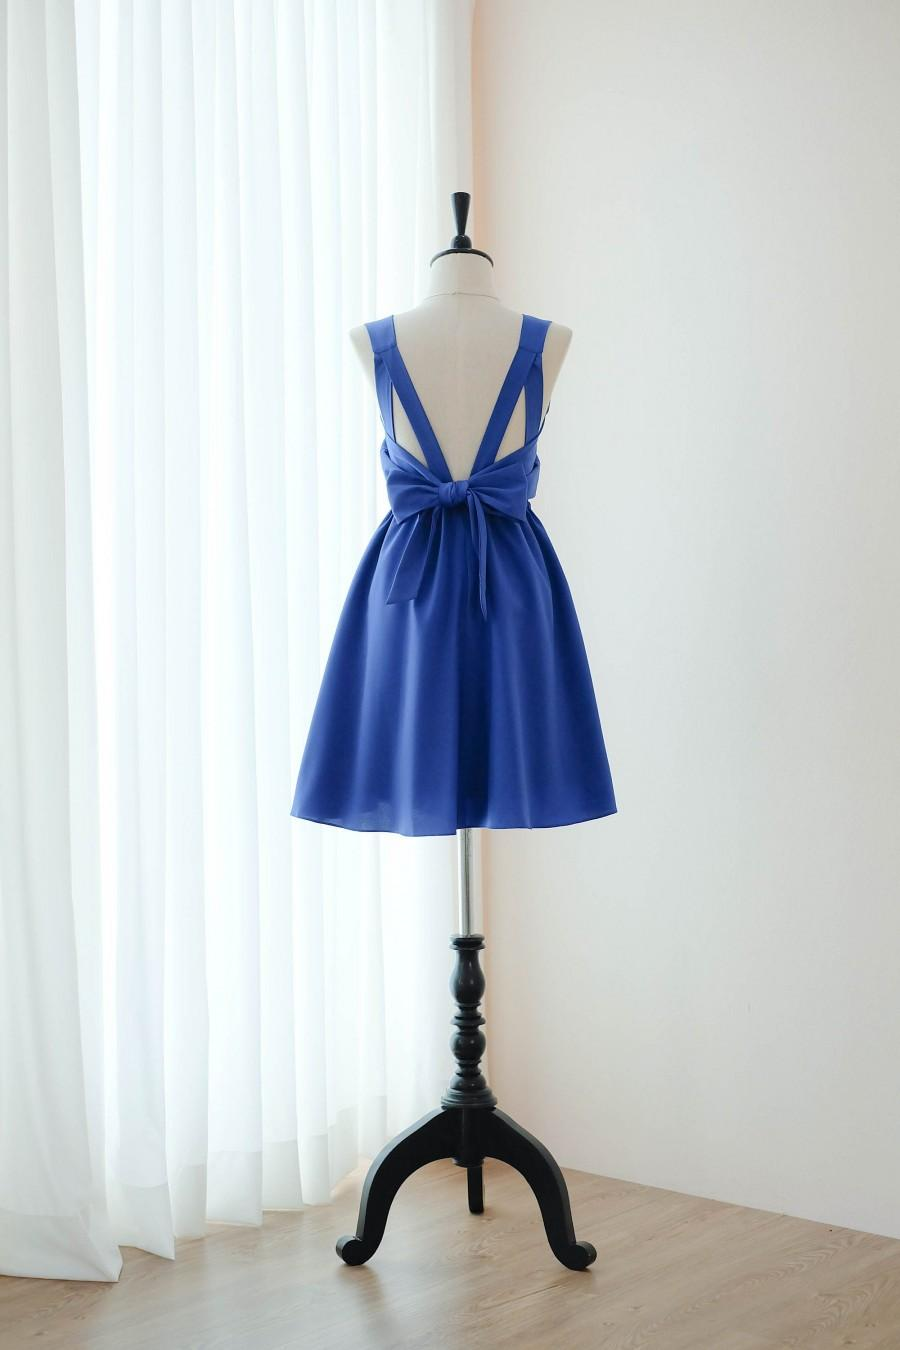 Hochzeit - Royal blue dress indigo Bridesmaid dress Wedding Prom dress Cocktail Party dress Evening dress Backless bow dress